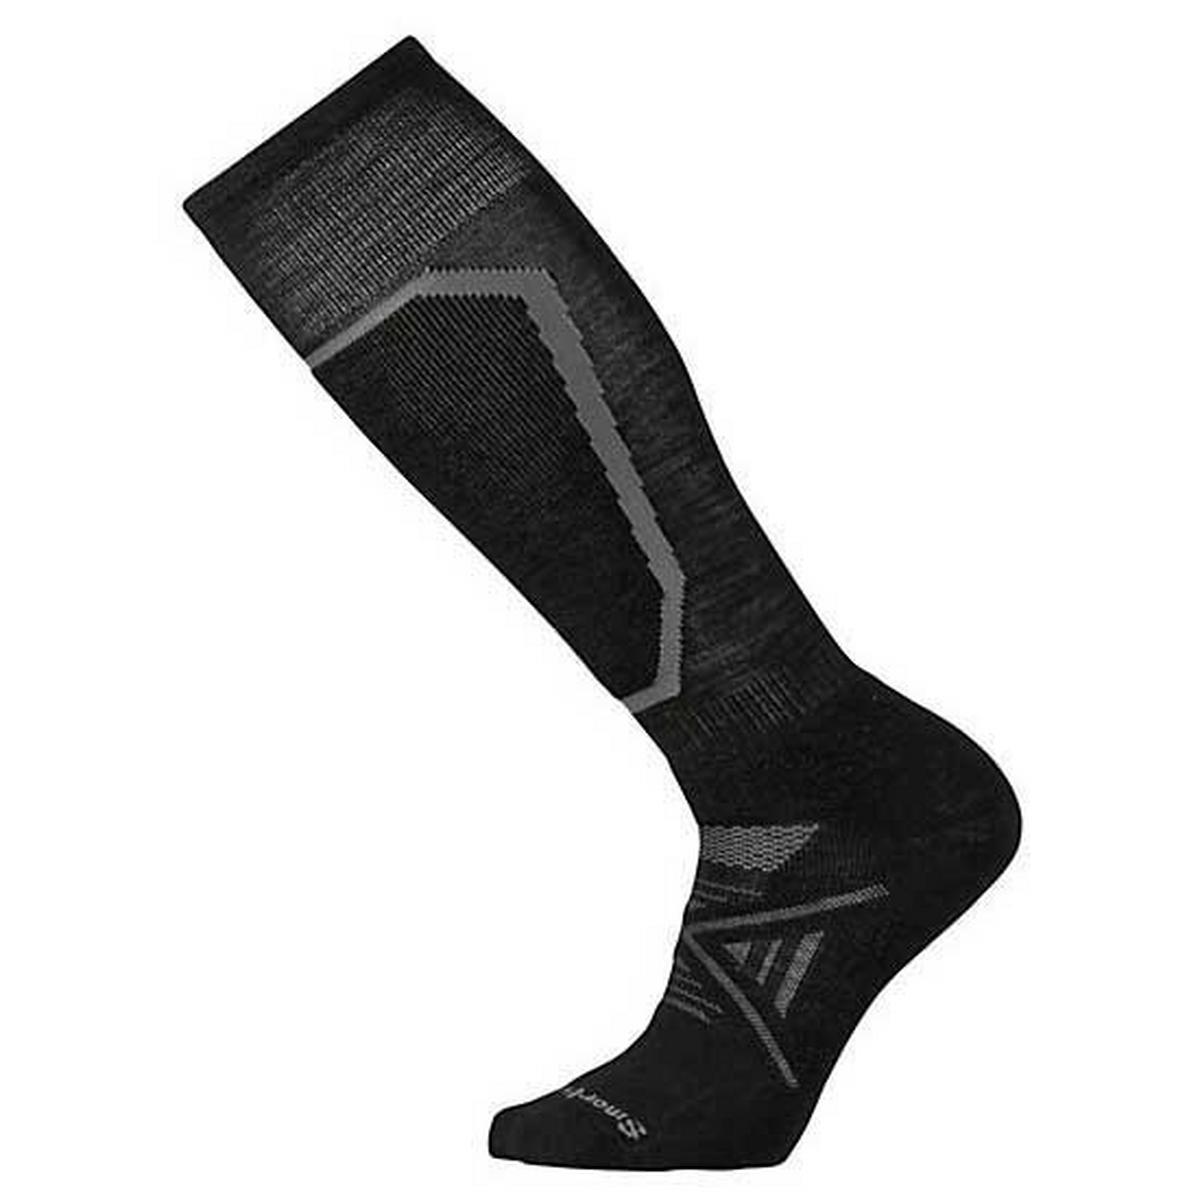 Smartwool Men's Ski Medium Pattern Sock